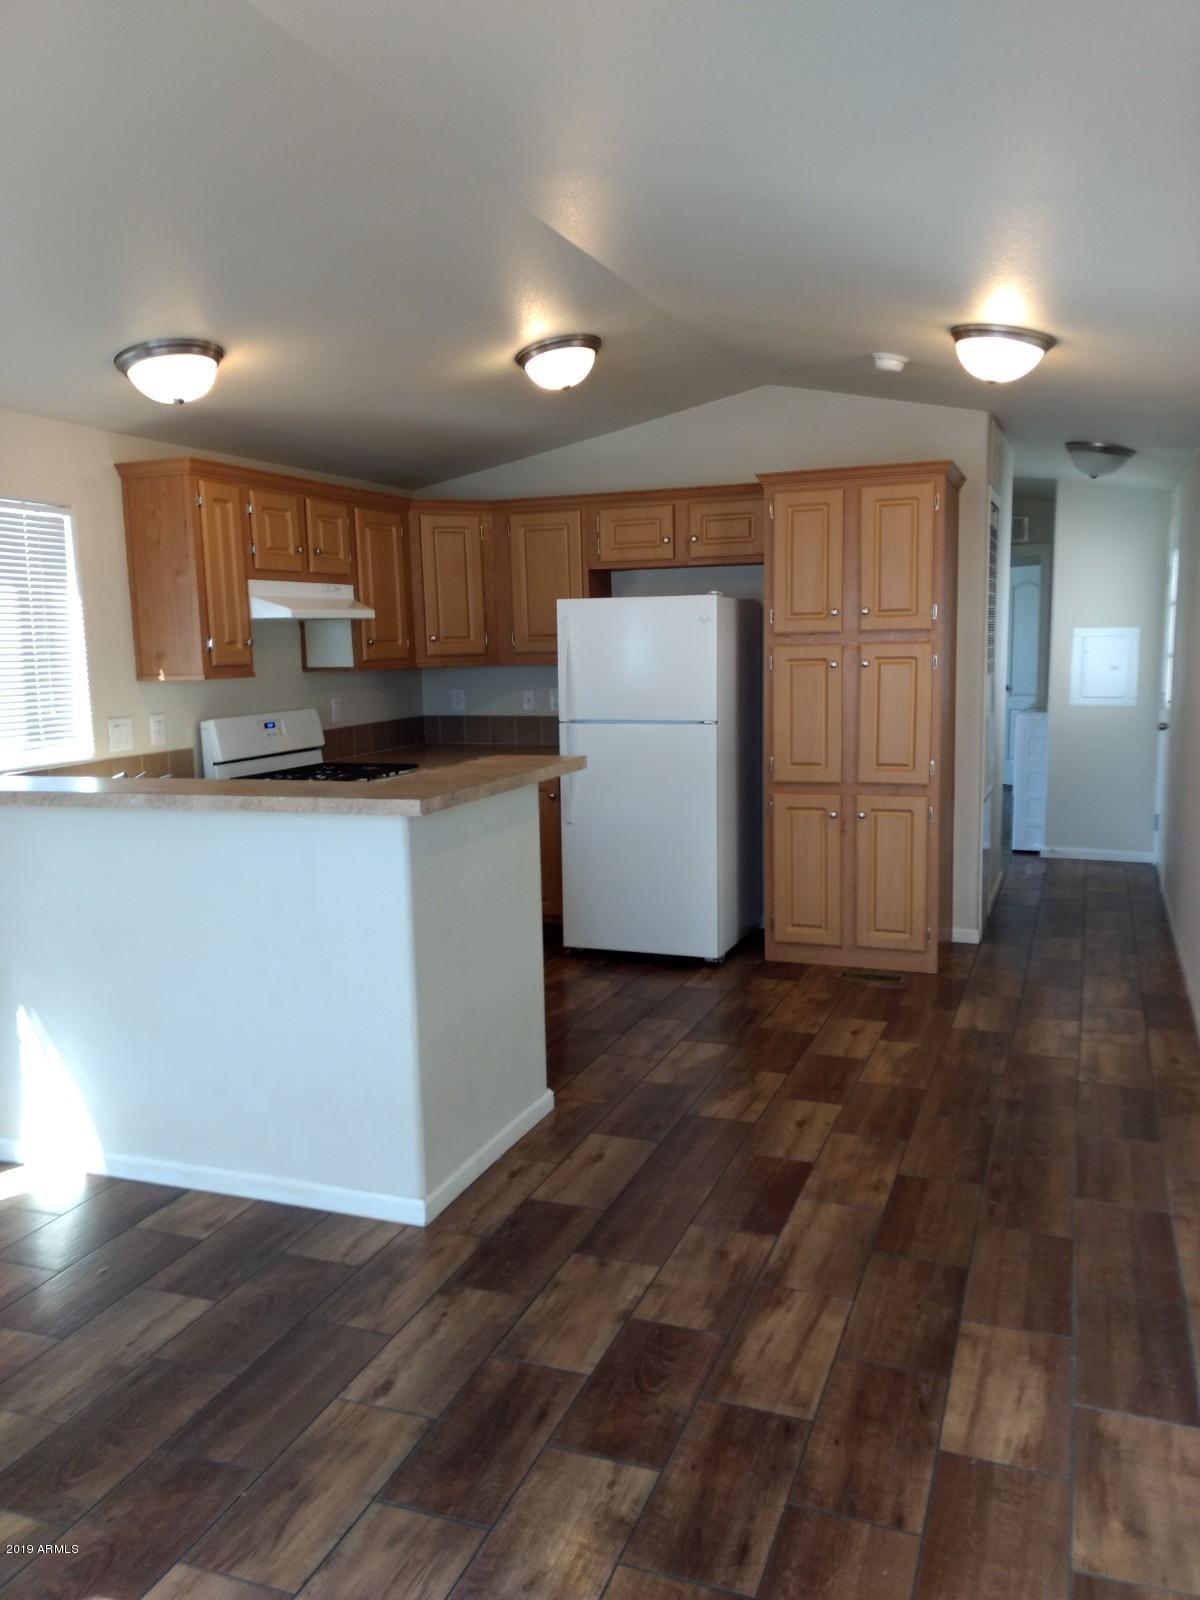 MLS 5943182 5200 E Main -- Unit J05, Mesa, AZ 85205 Mesa AZ Affordable